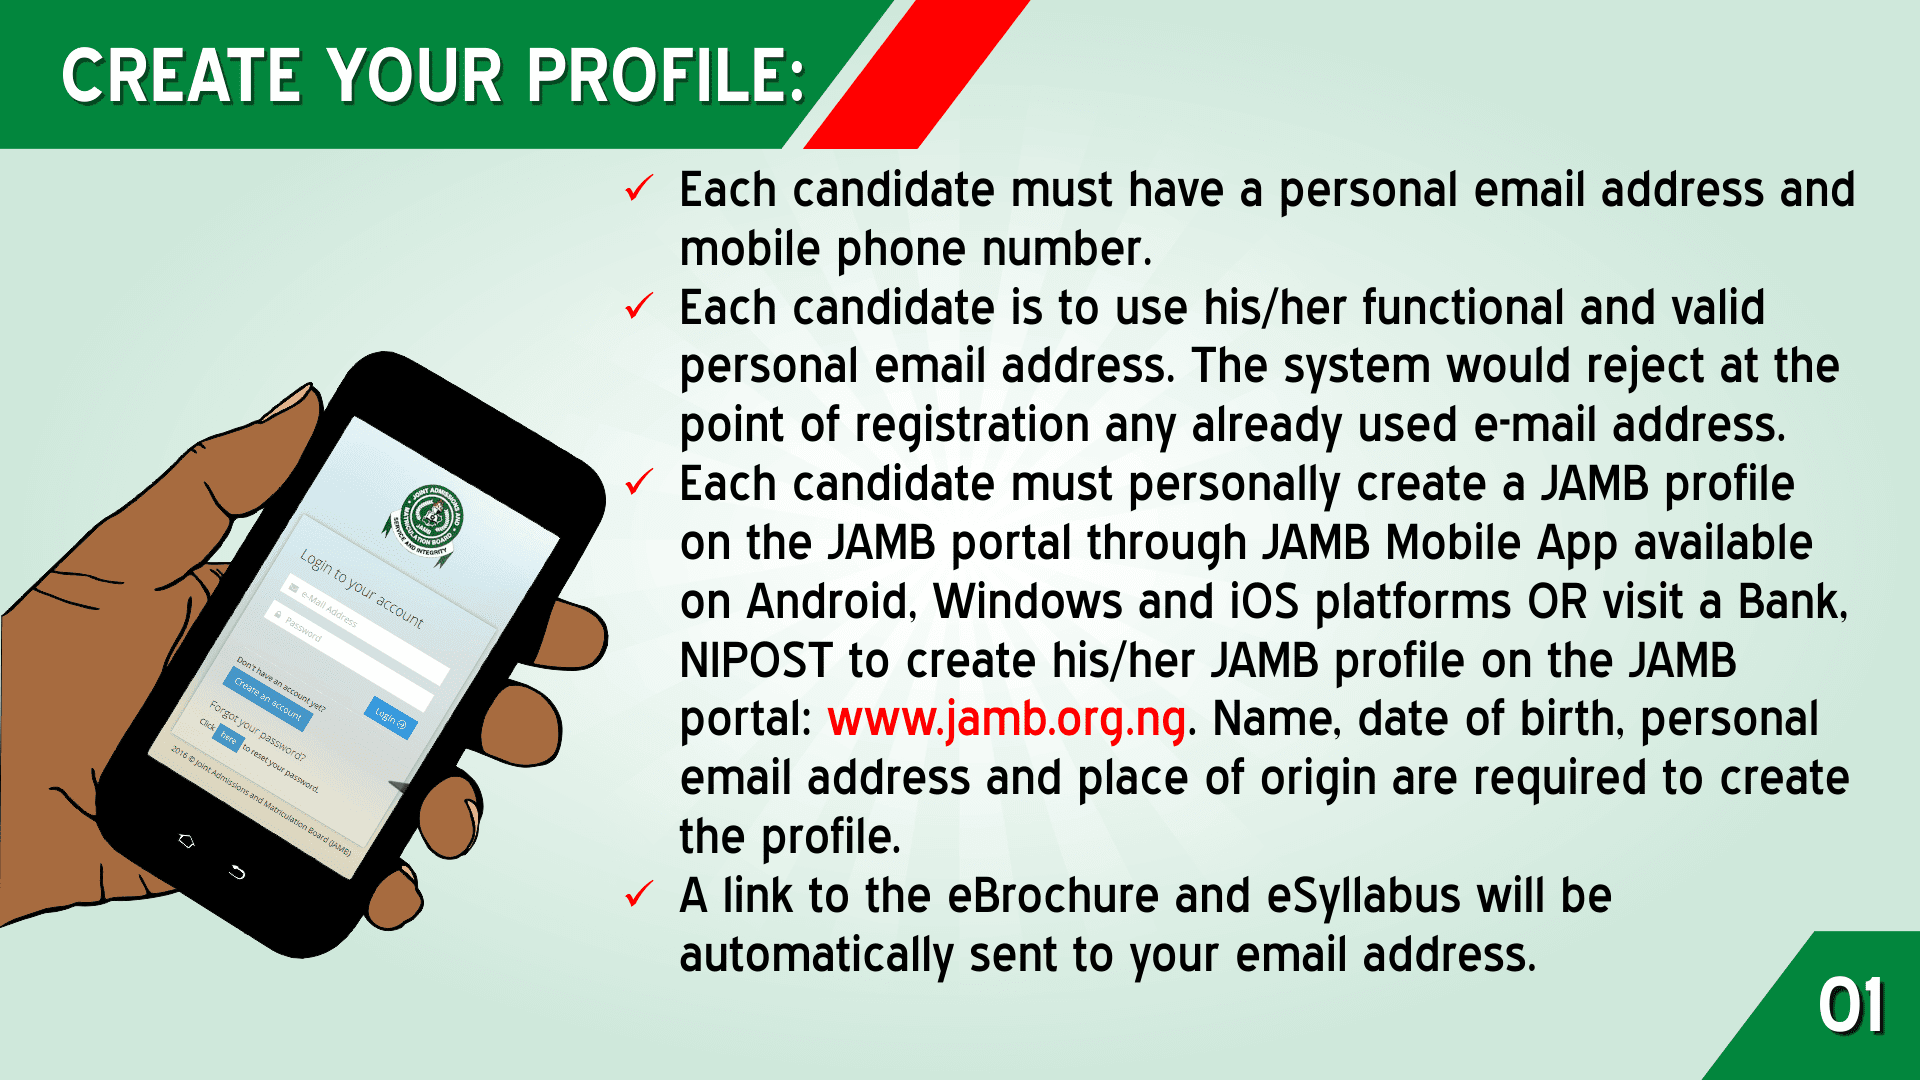 JAMB 2021 Top 5 UTME & DE Registration Tips [PHOTOS]